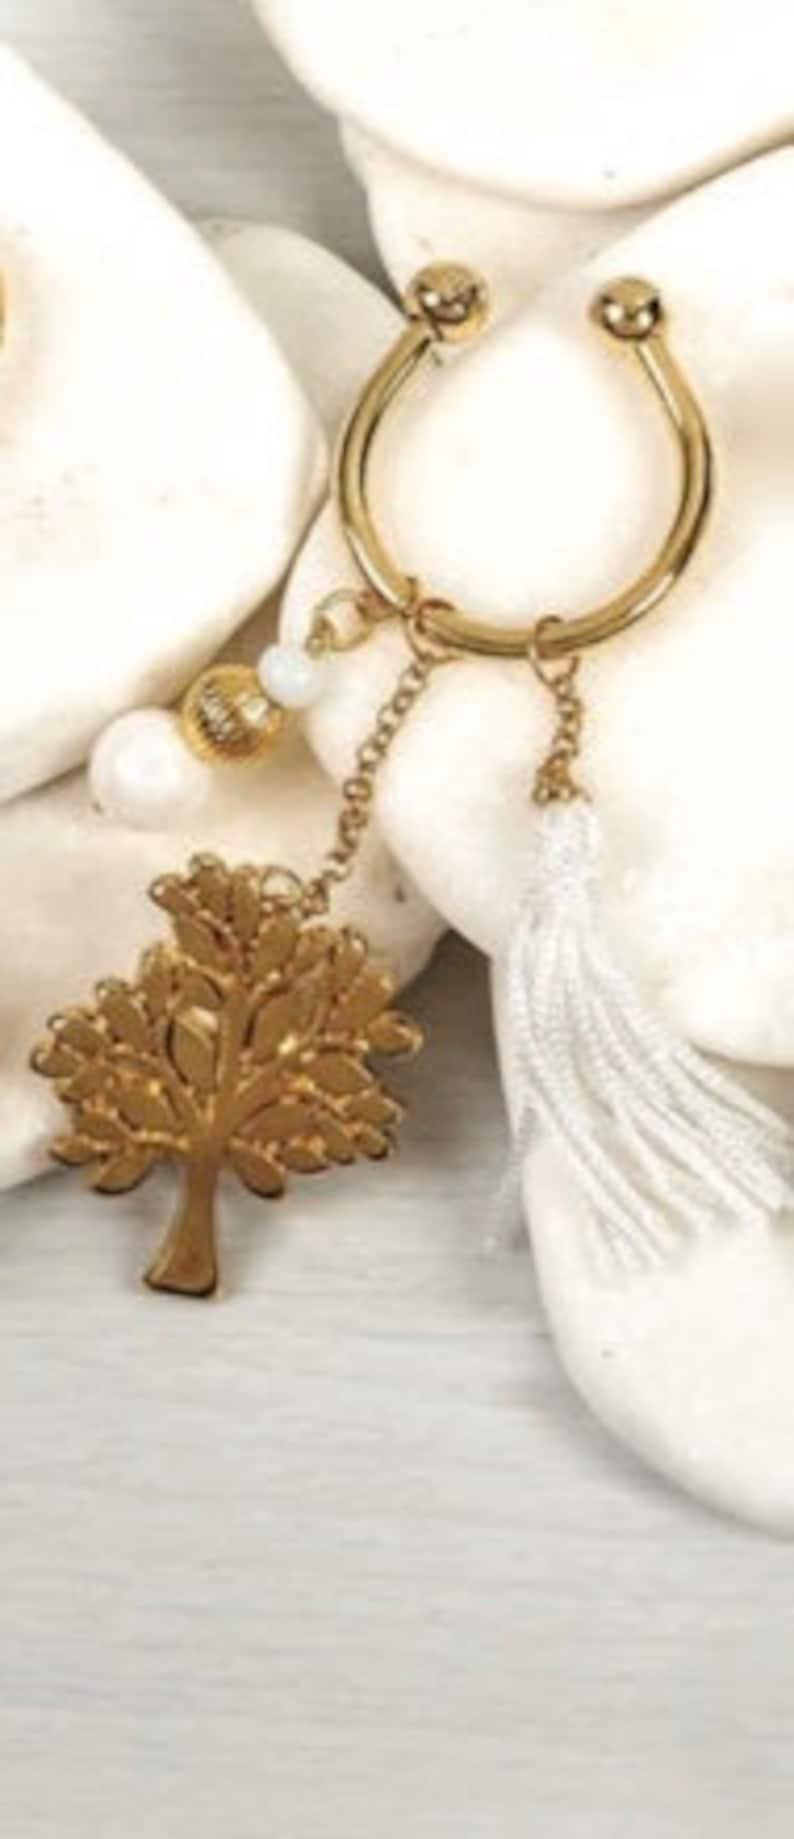 Greek Christening 10 Baptism Keychain Favors Recuerdos bautizo Charm Witness Martyrika First communion Guests Gifts